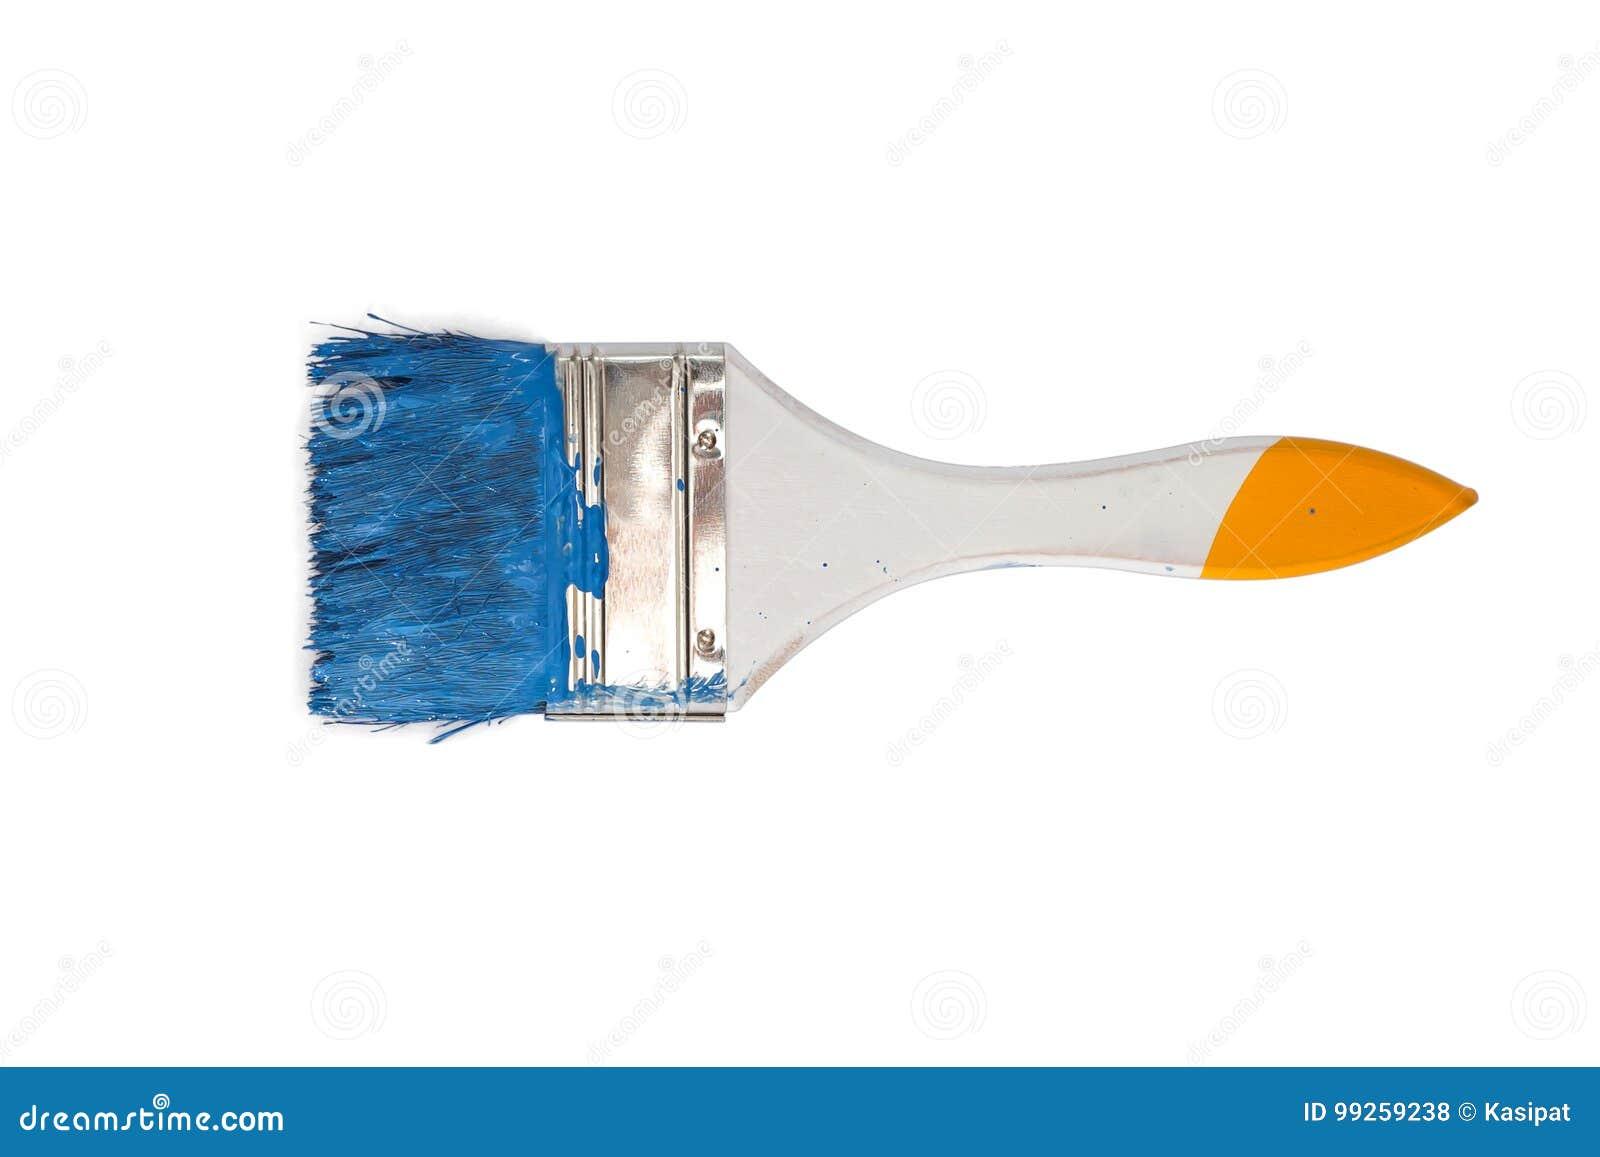 Pinte ferramentas